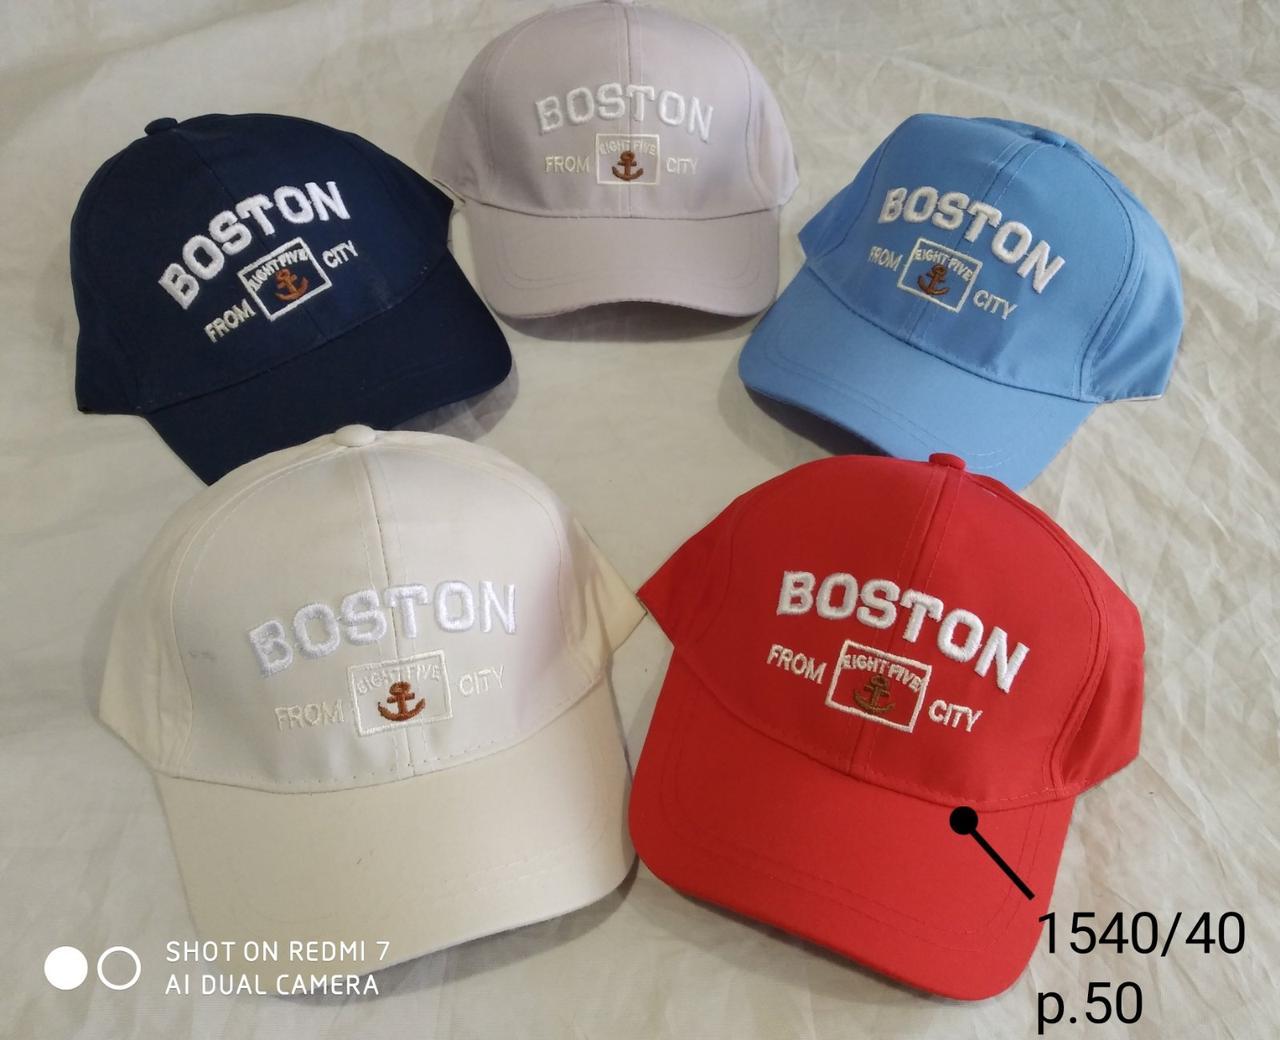 Кепка для мальчика Boston р. 50 опт